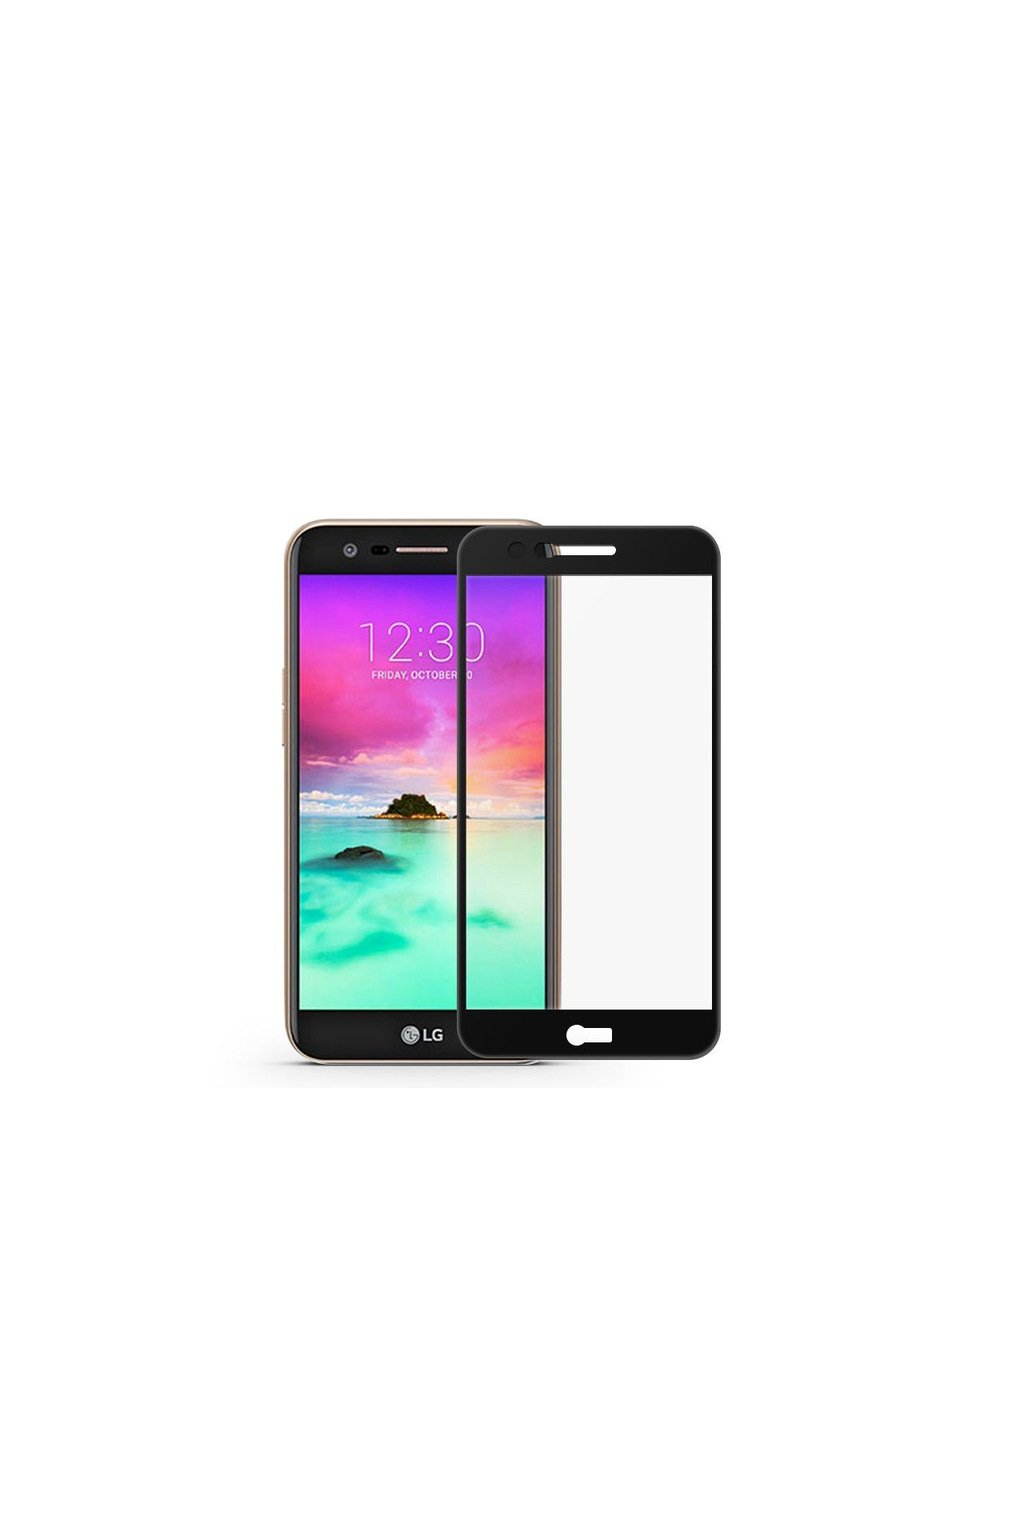 1PCS Tempered Glass For LG K10 2017 Screen Protector for LG LV5 M250N Full Cover for.jpg 640x640